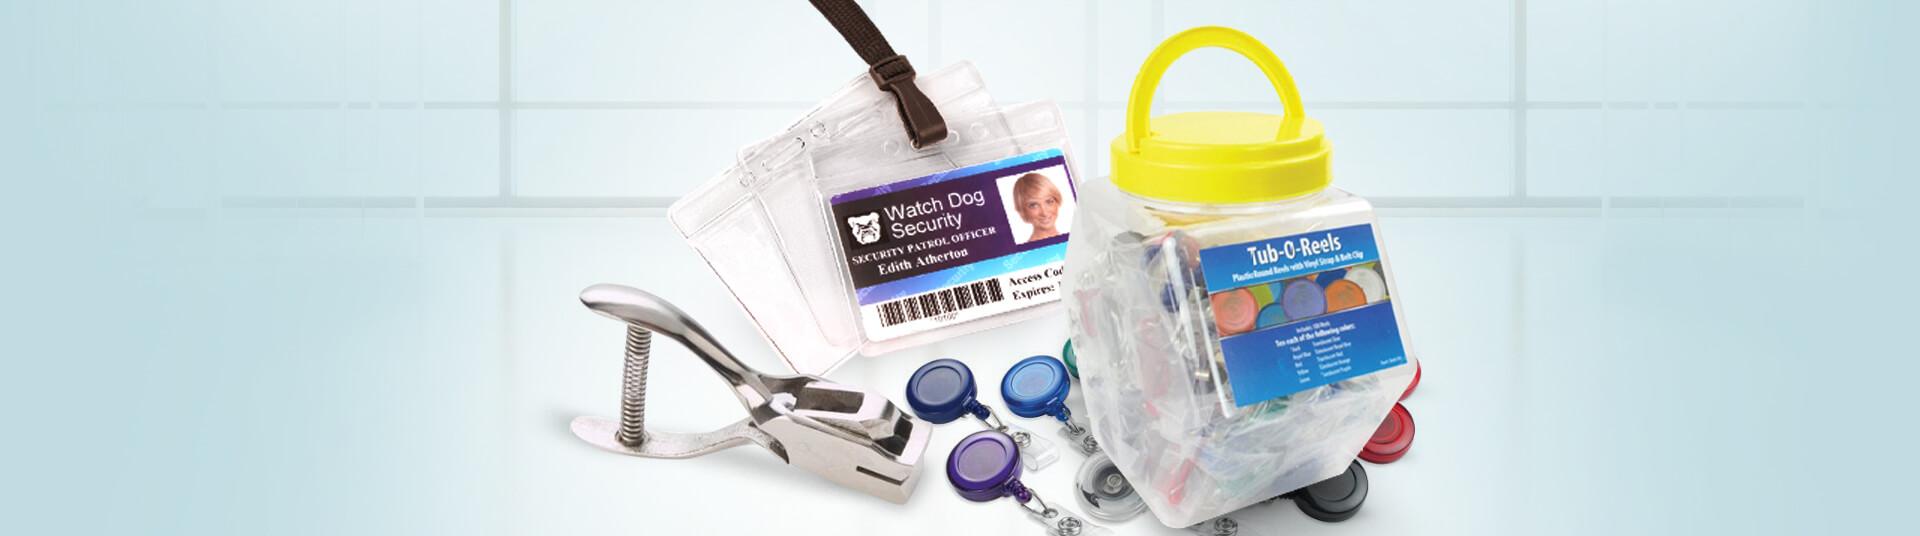 Most Popular ID Accessories